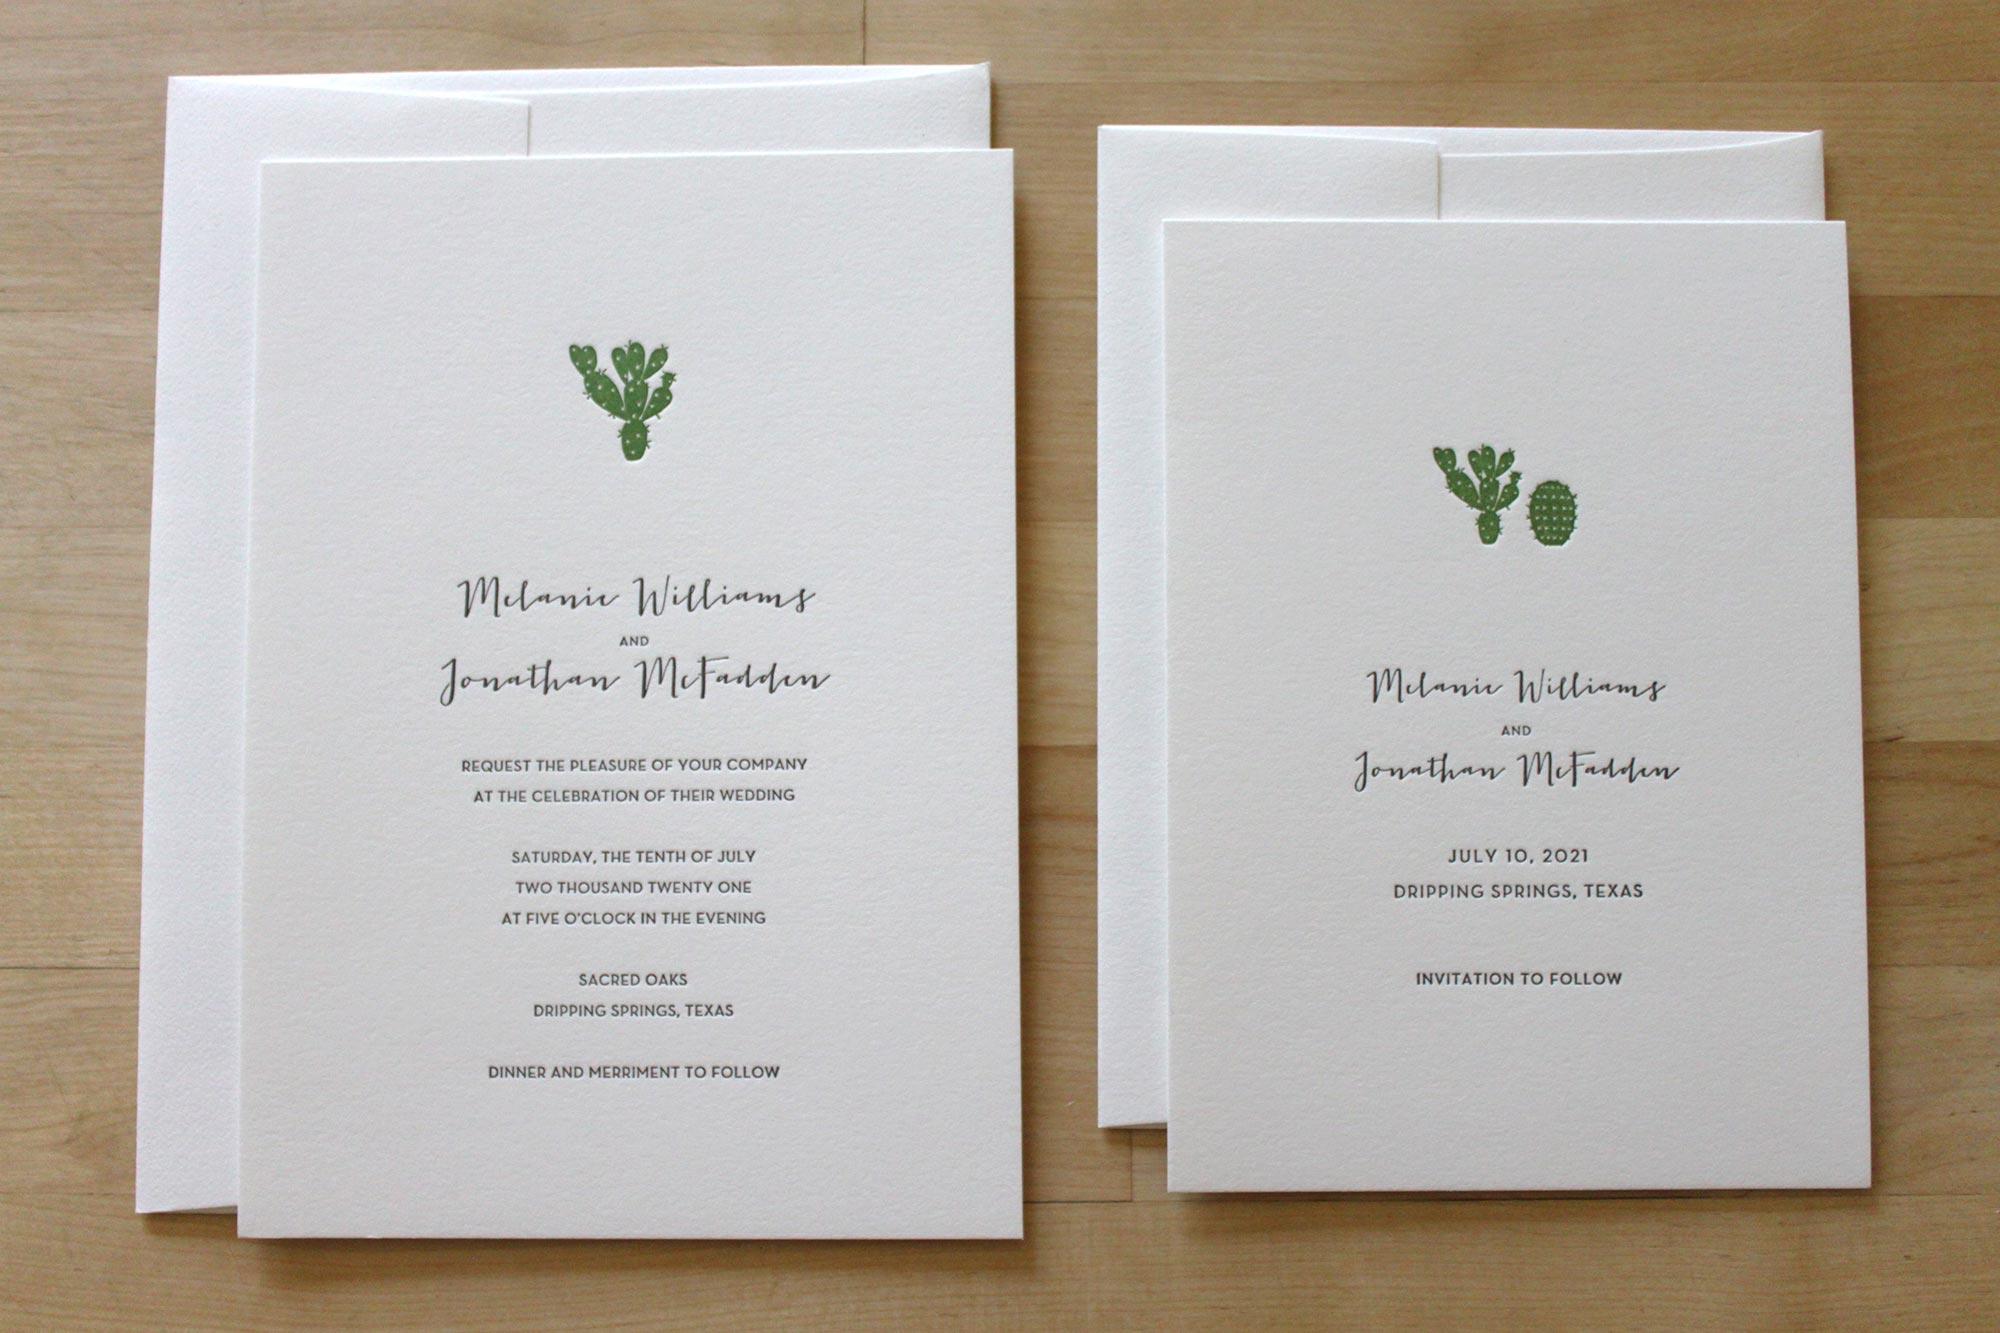 Cactus-Full-Page-2-letterpress-wedding-invitations.jpg